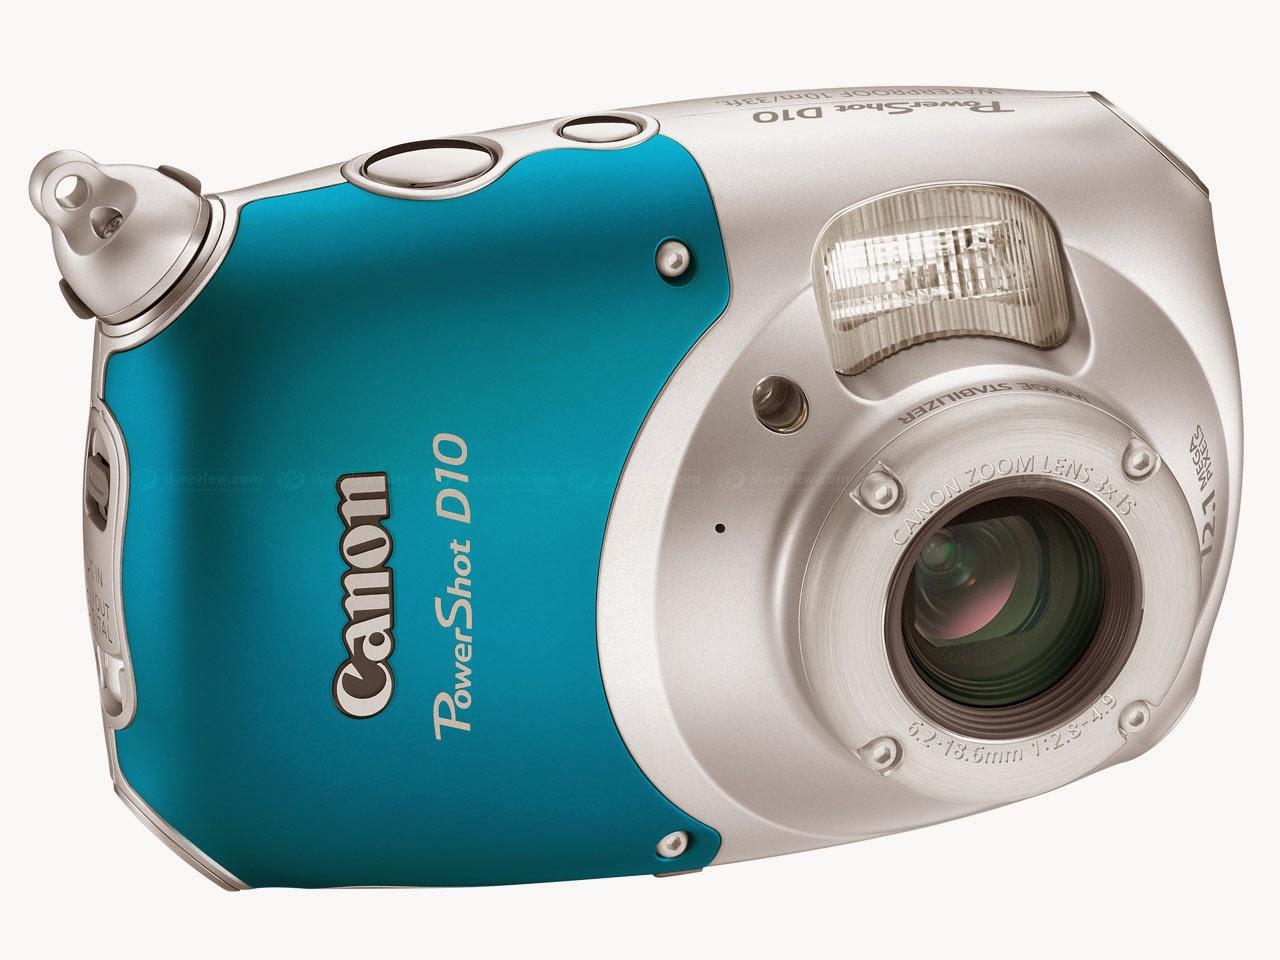 Canon Underwater D10 New Camera